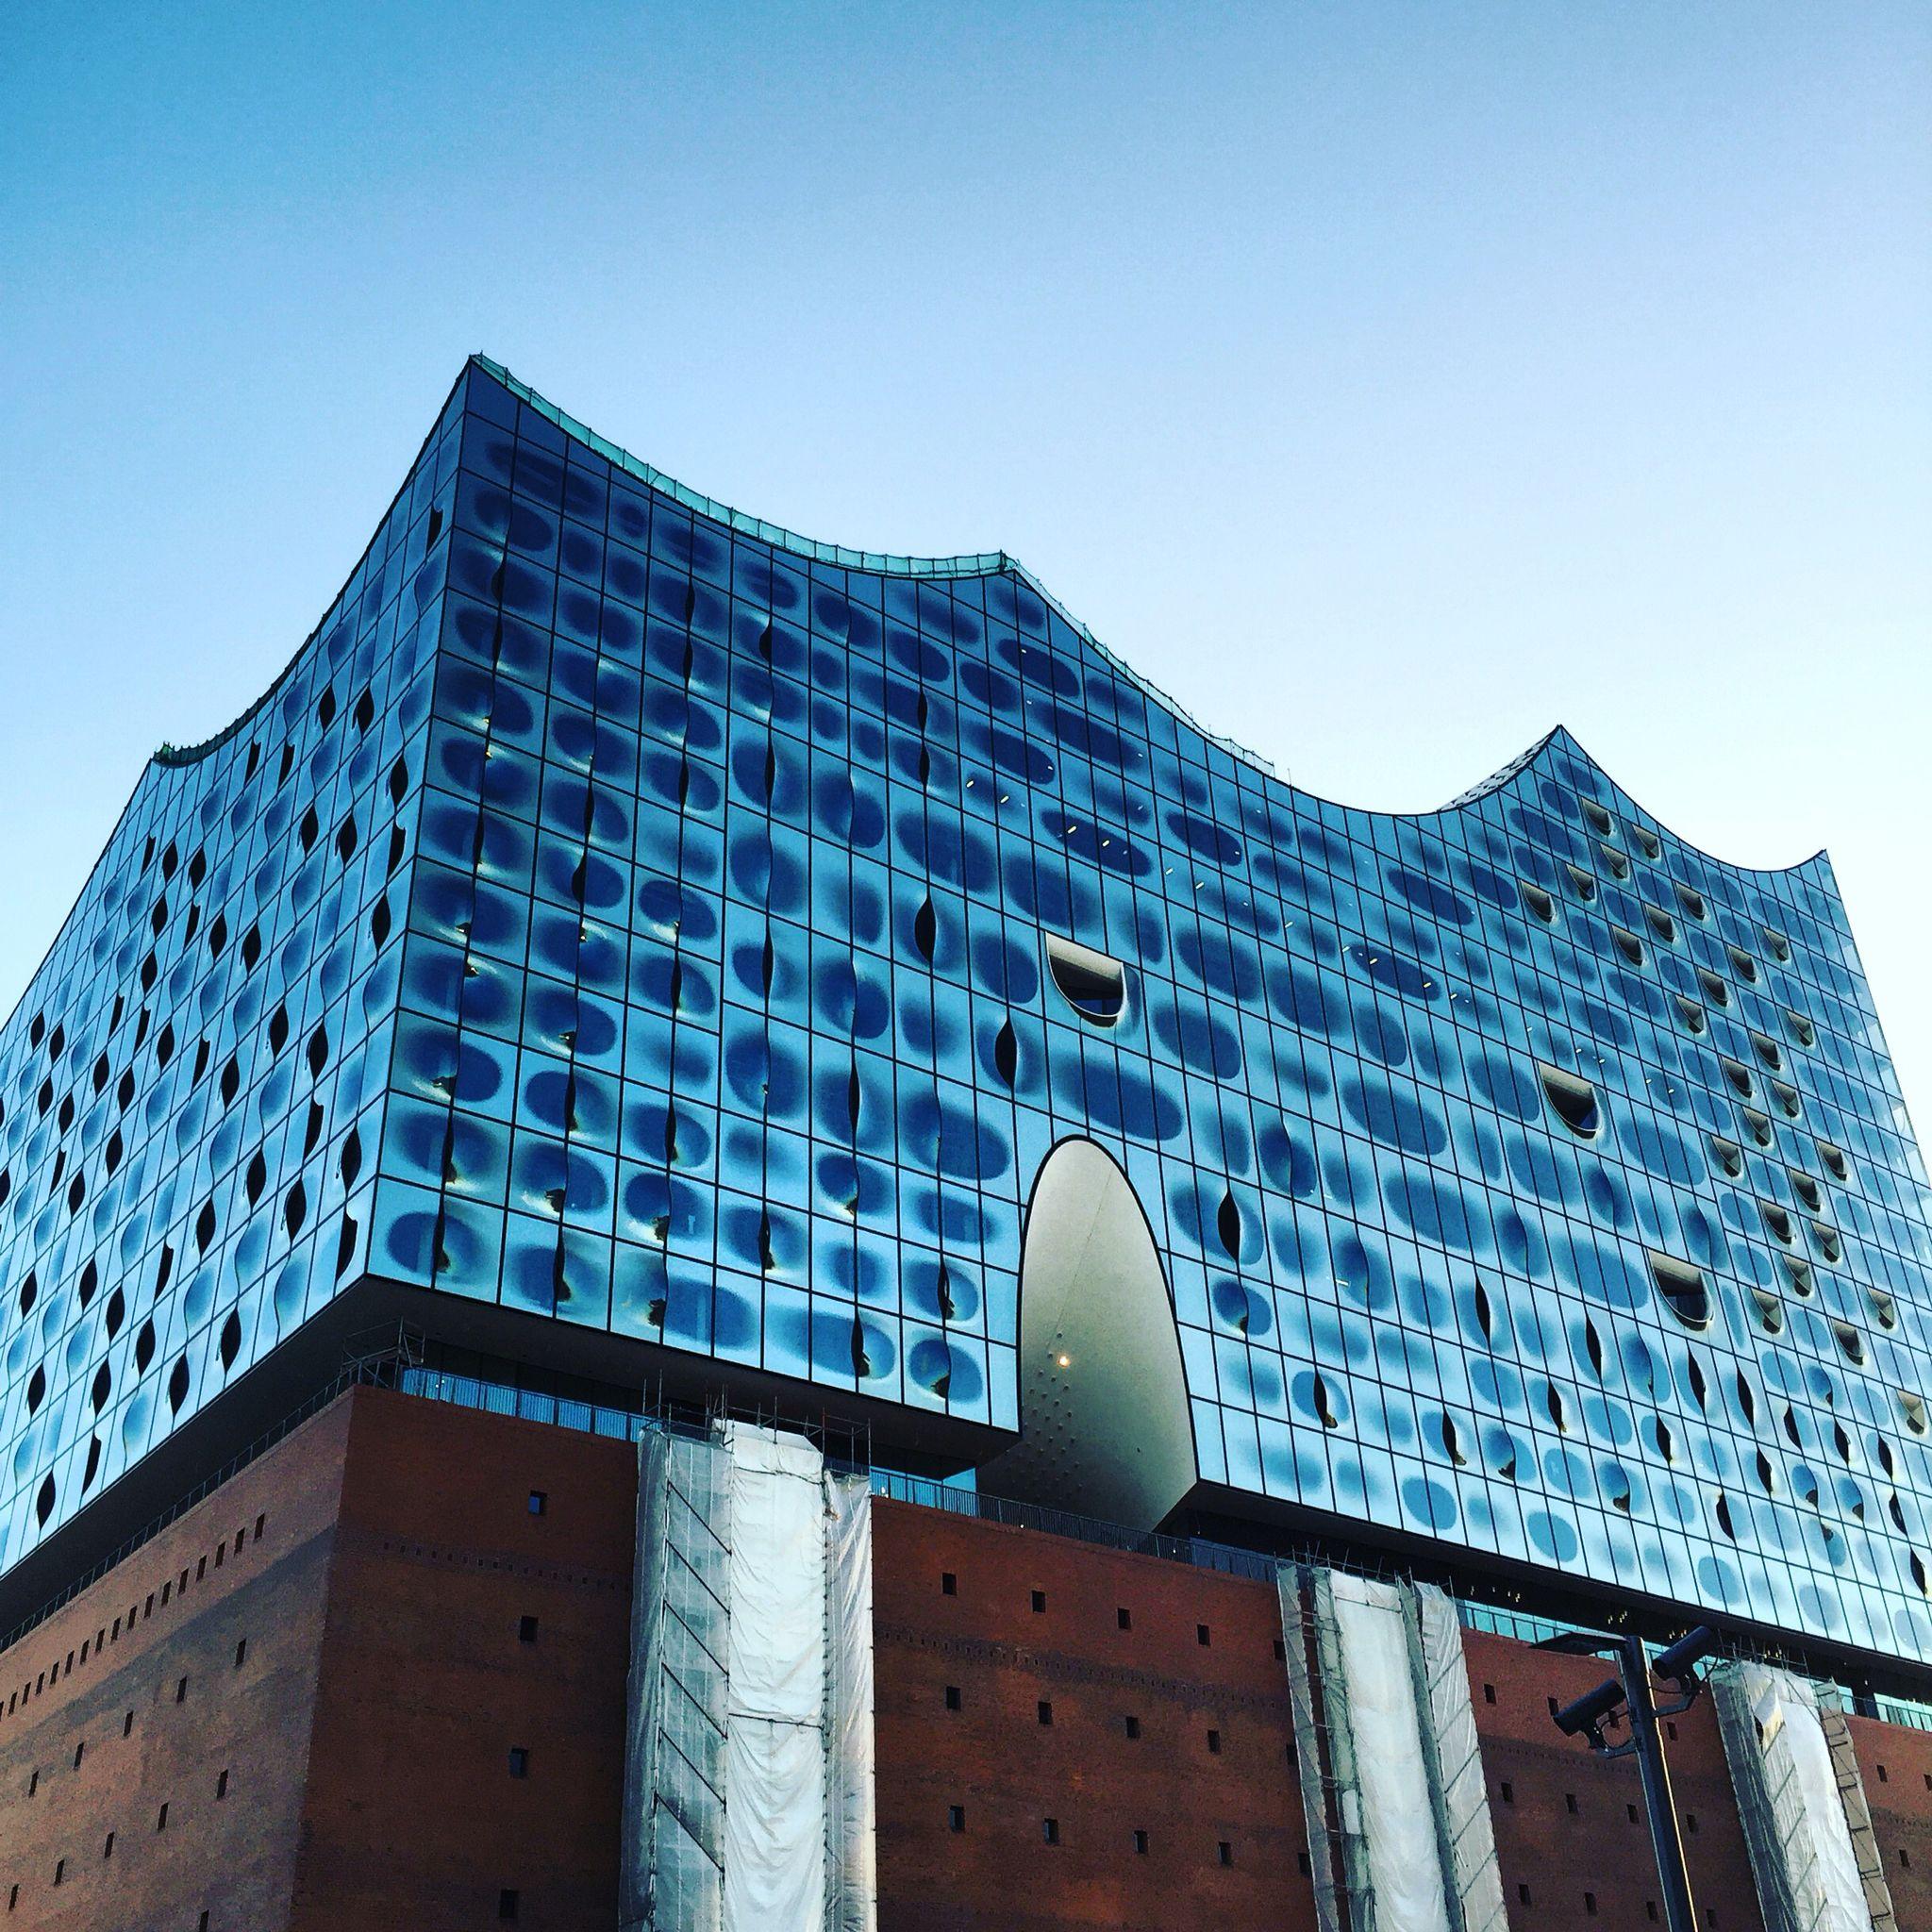 Elbphilharmonie Hamburg Architecture Building Renovations